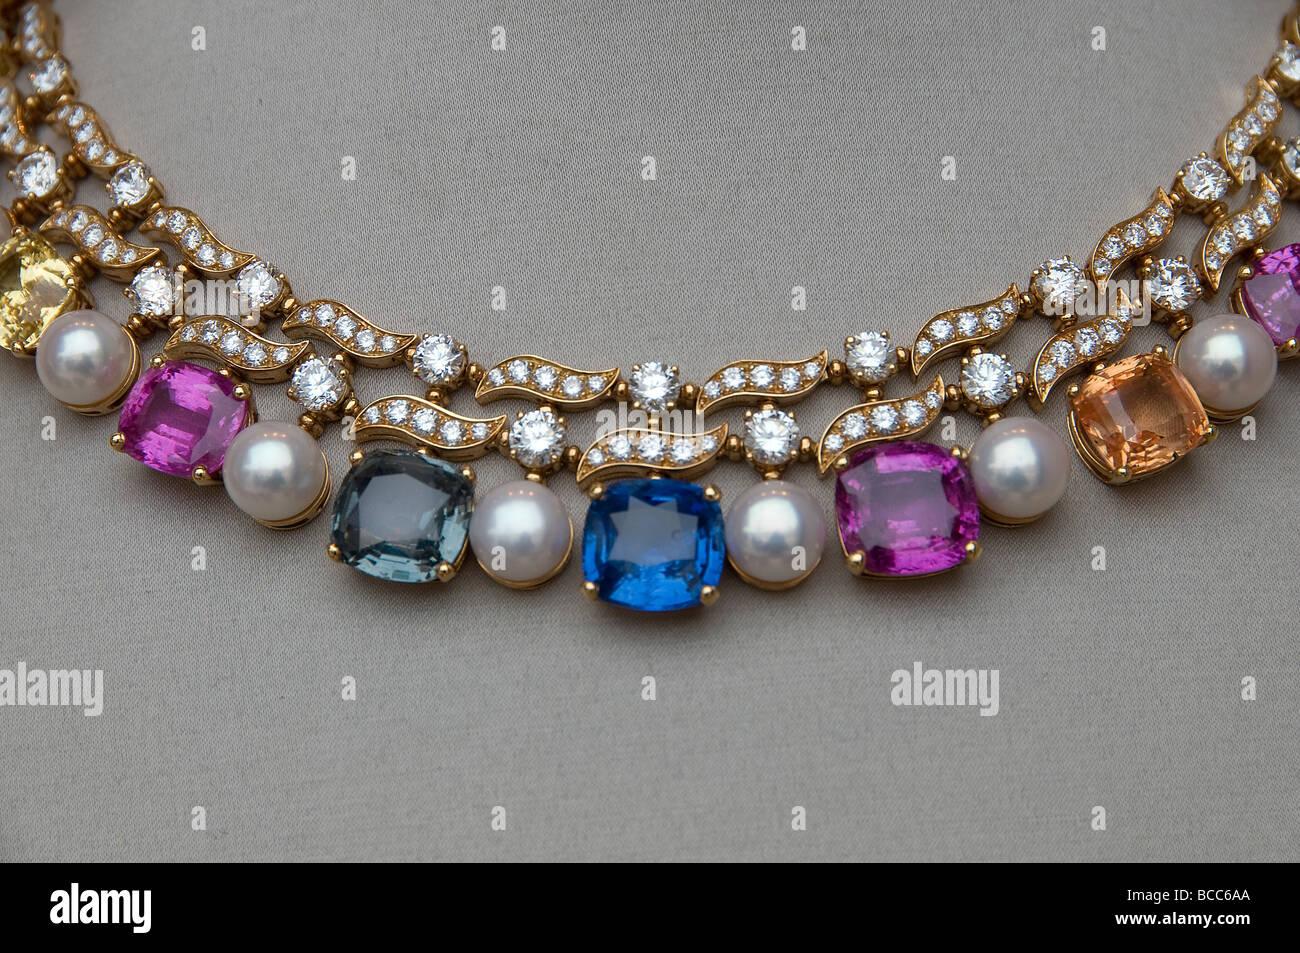 Bvlgari Bulgari Place Vendome Paris Jewel Jeweler chain - Stock Image